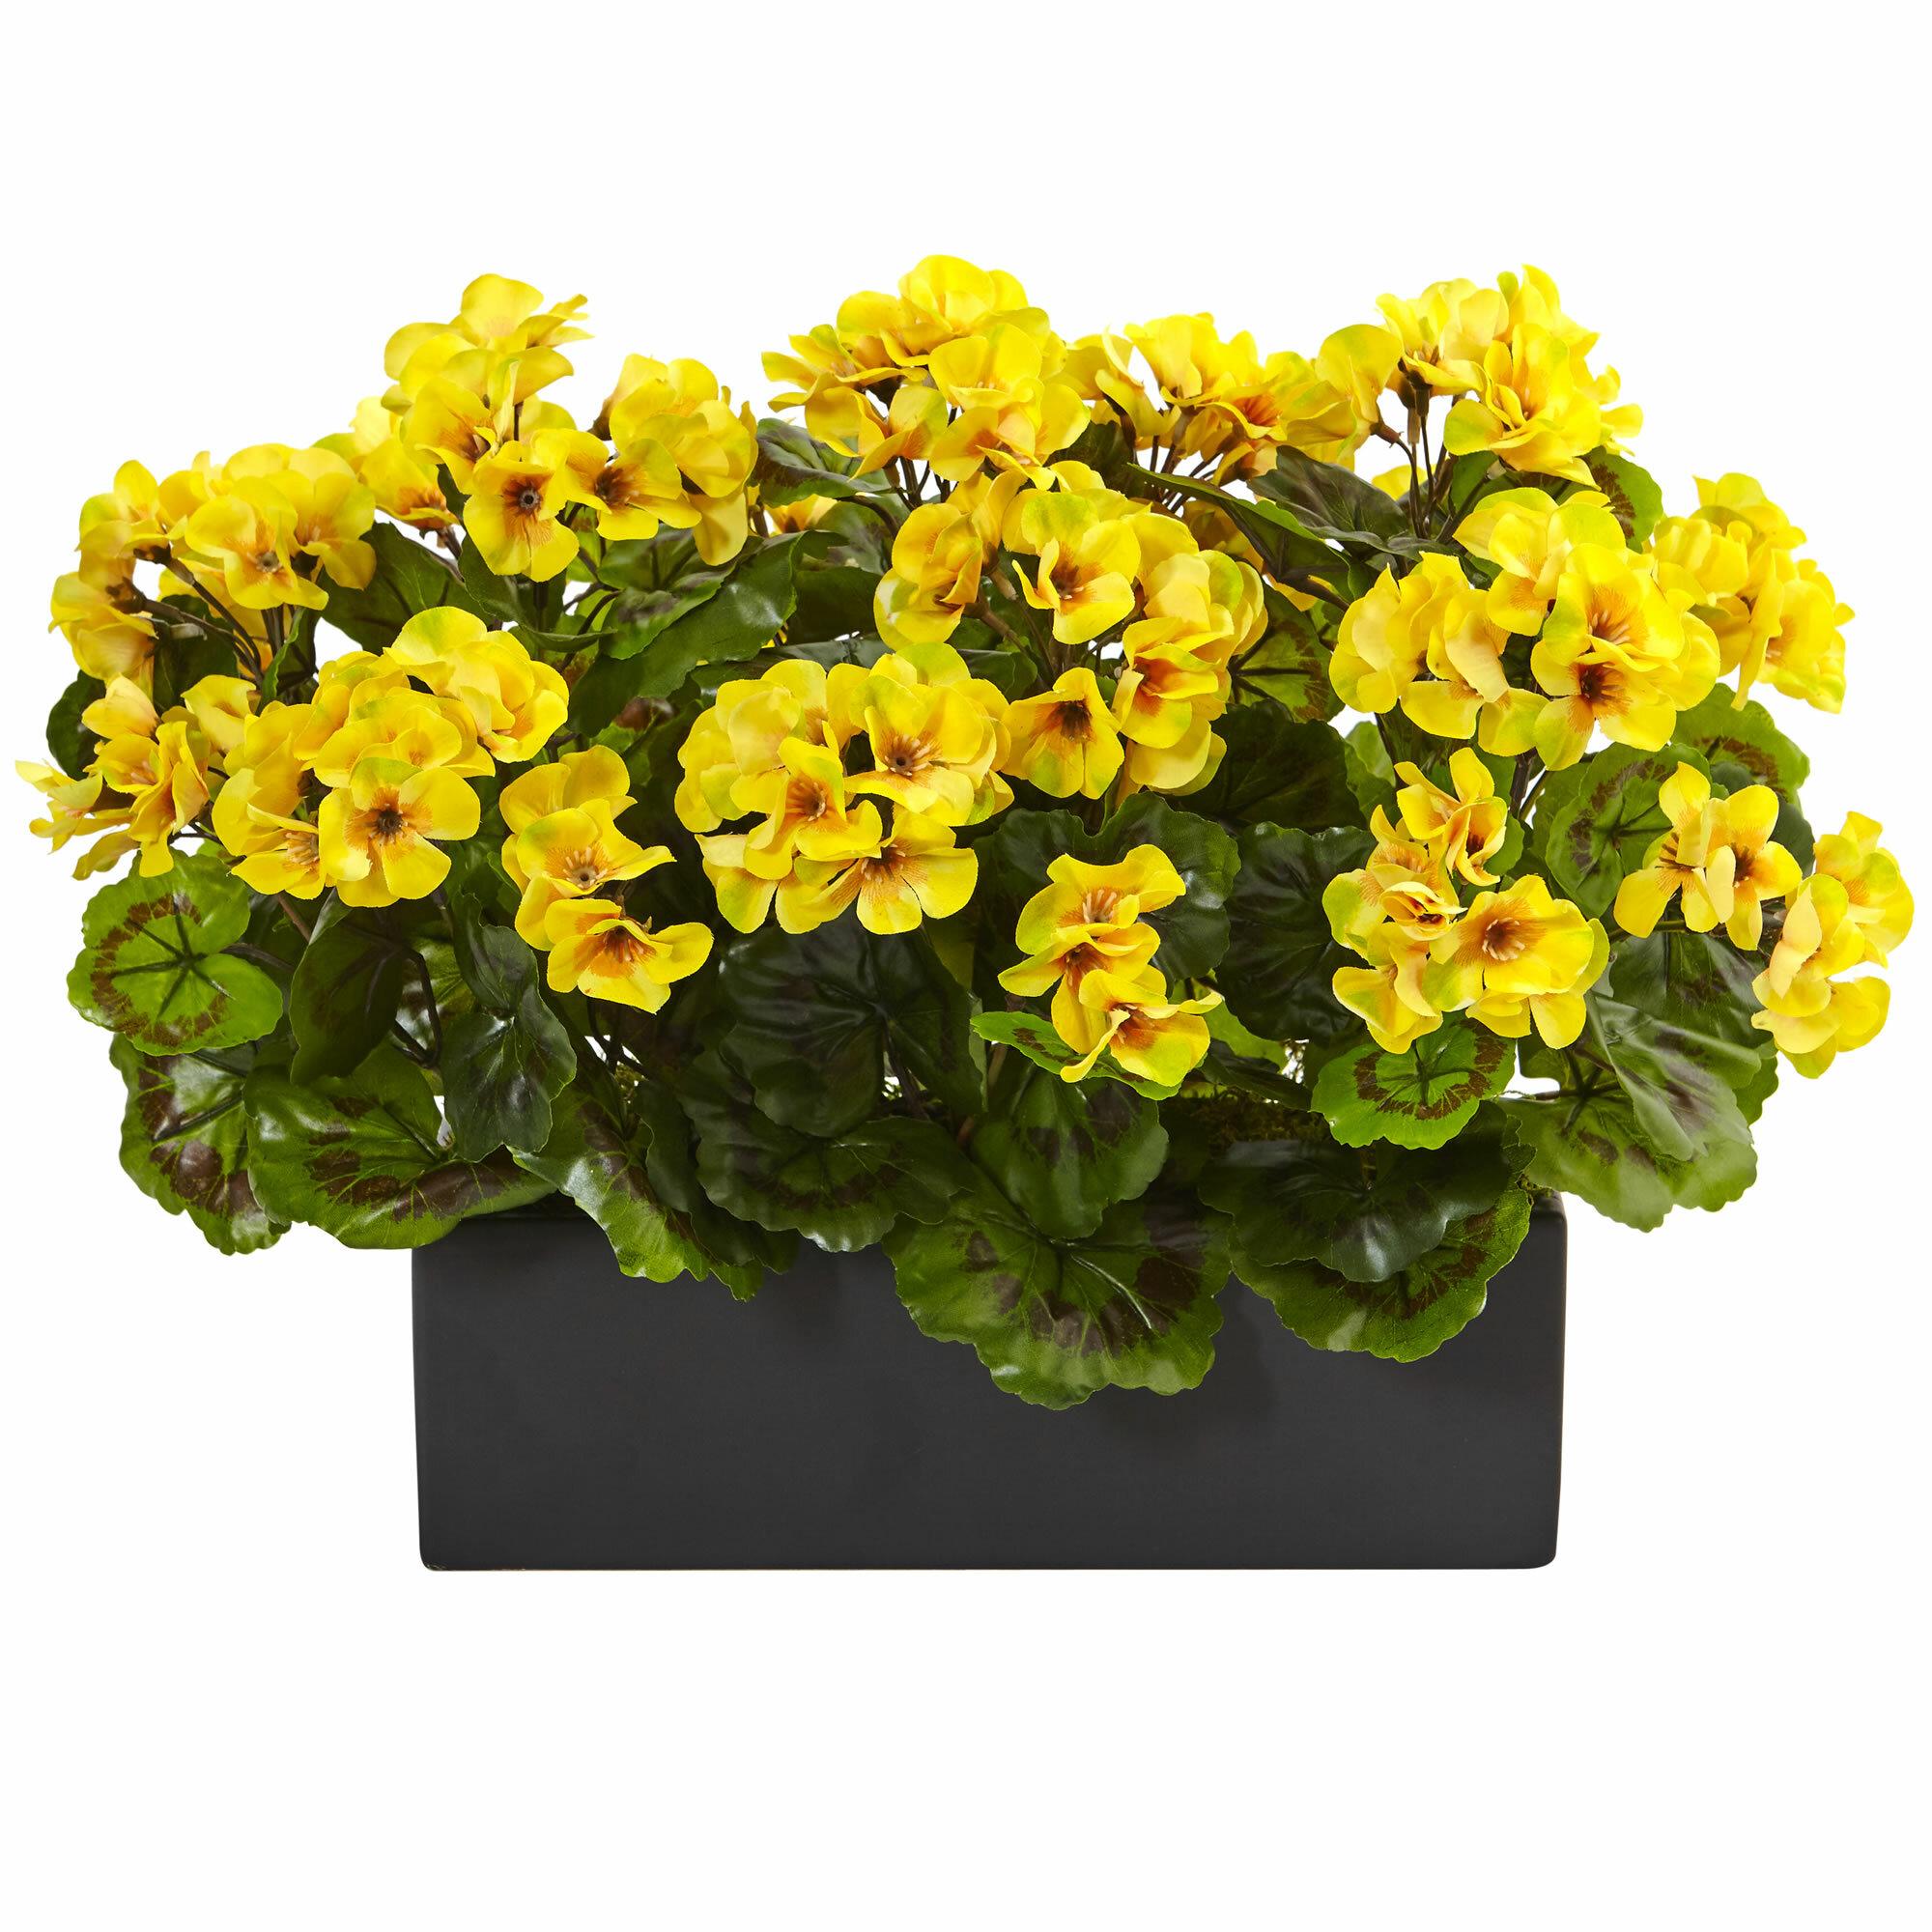 Red Barrel Studio Silk Geranium Plant Floral Arrangement in Planter ...